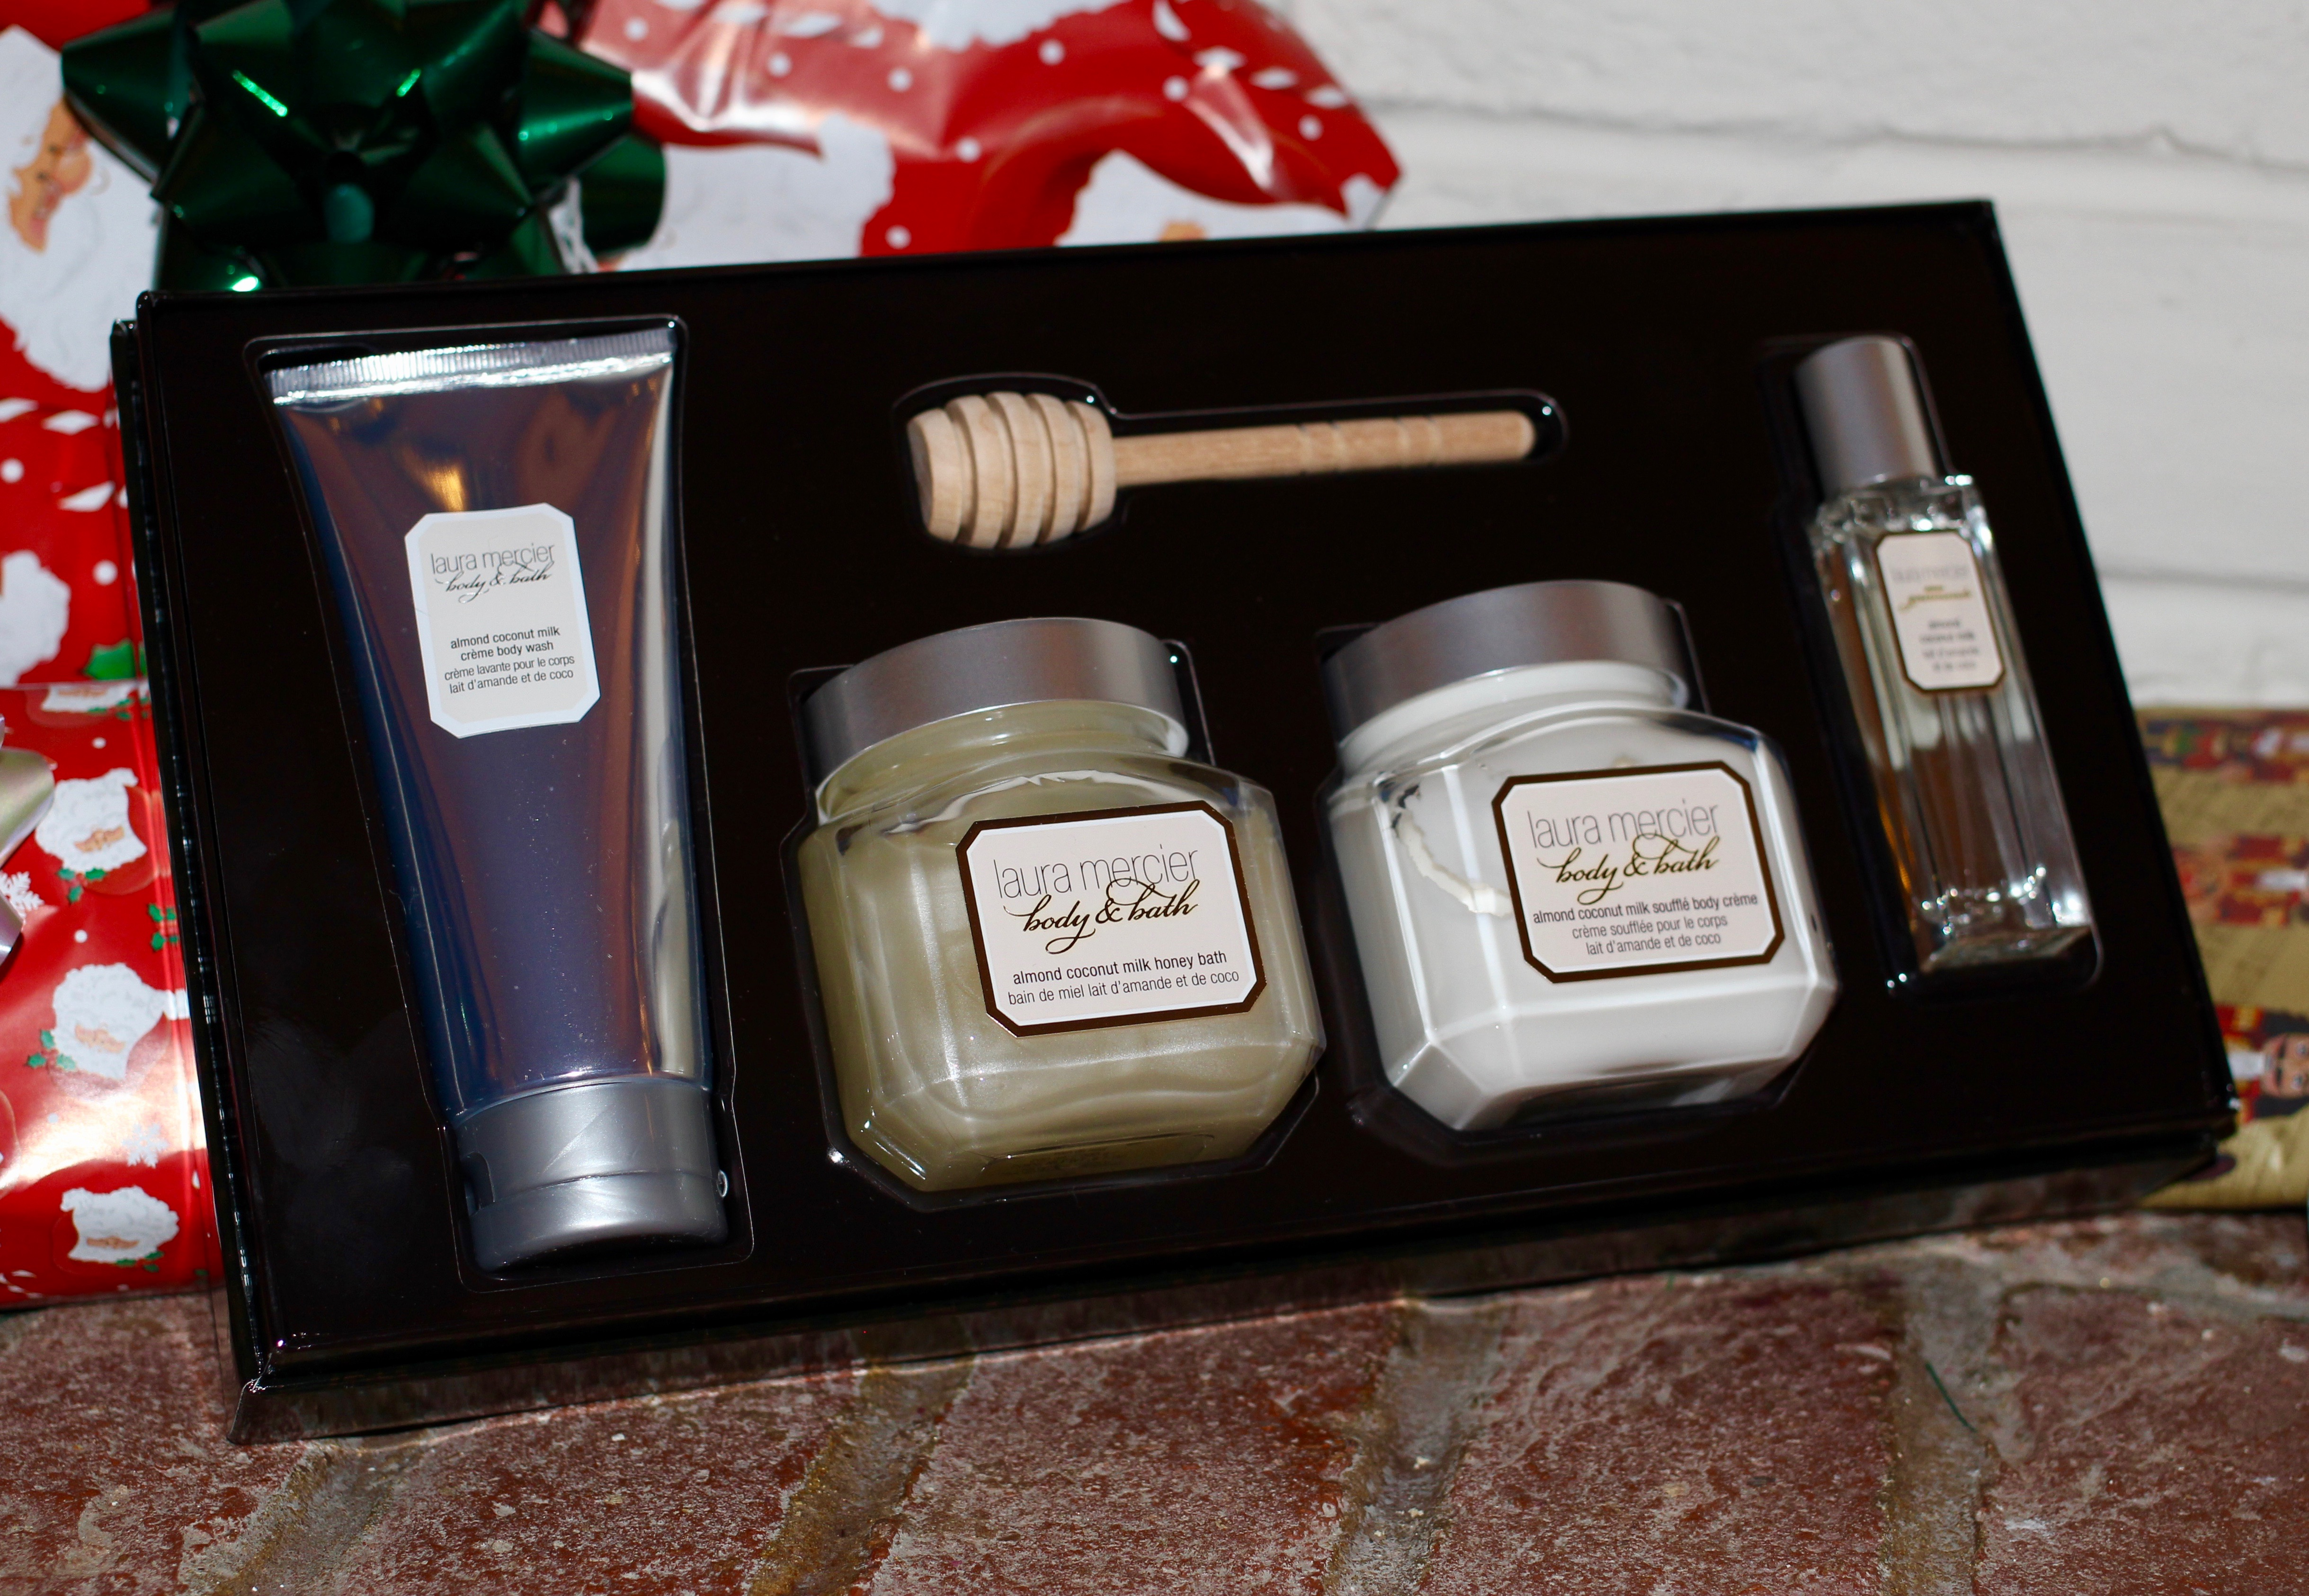 Laura Mercier Gift Sets Reviewed